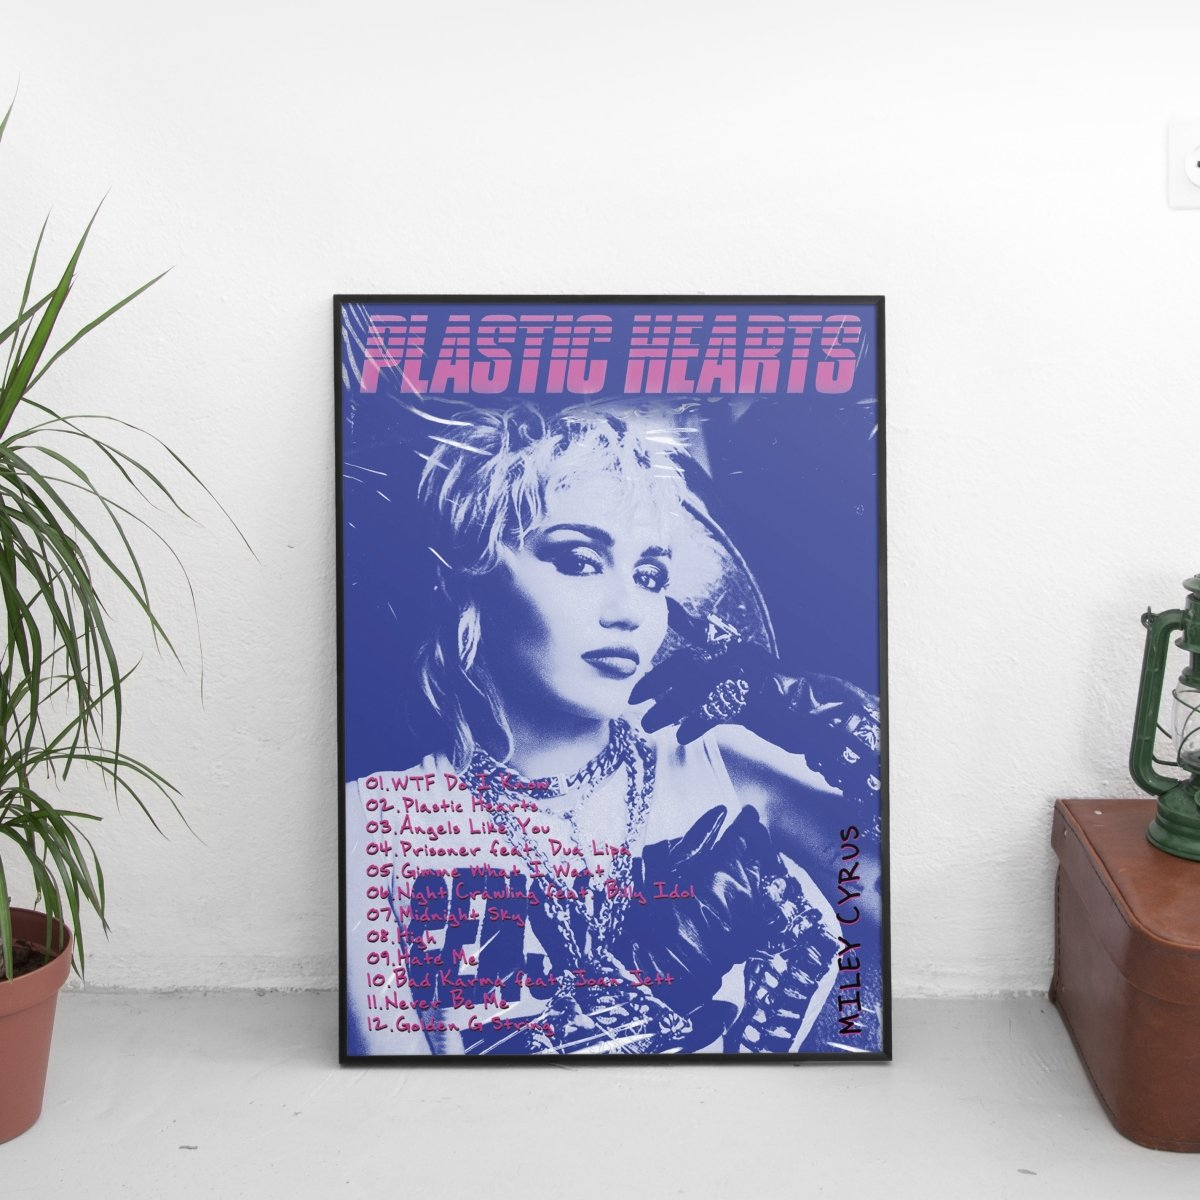 Miley Cyrus - Plastic Hearts Tracklist Poster